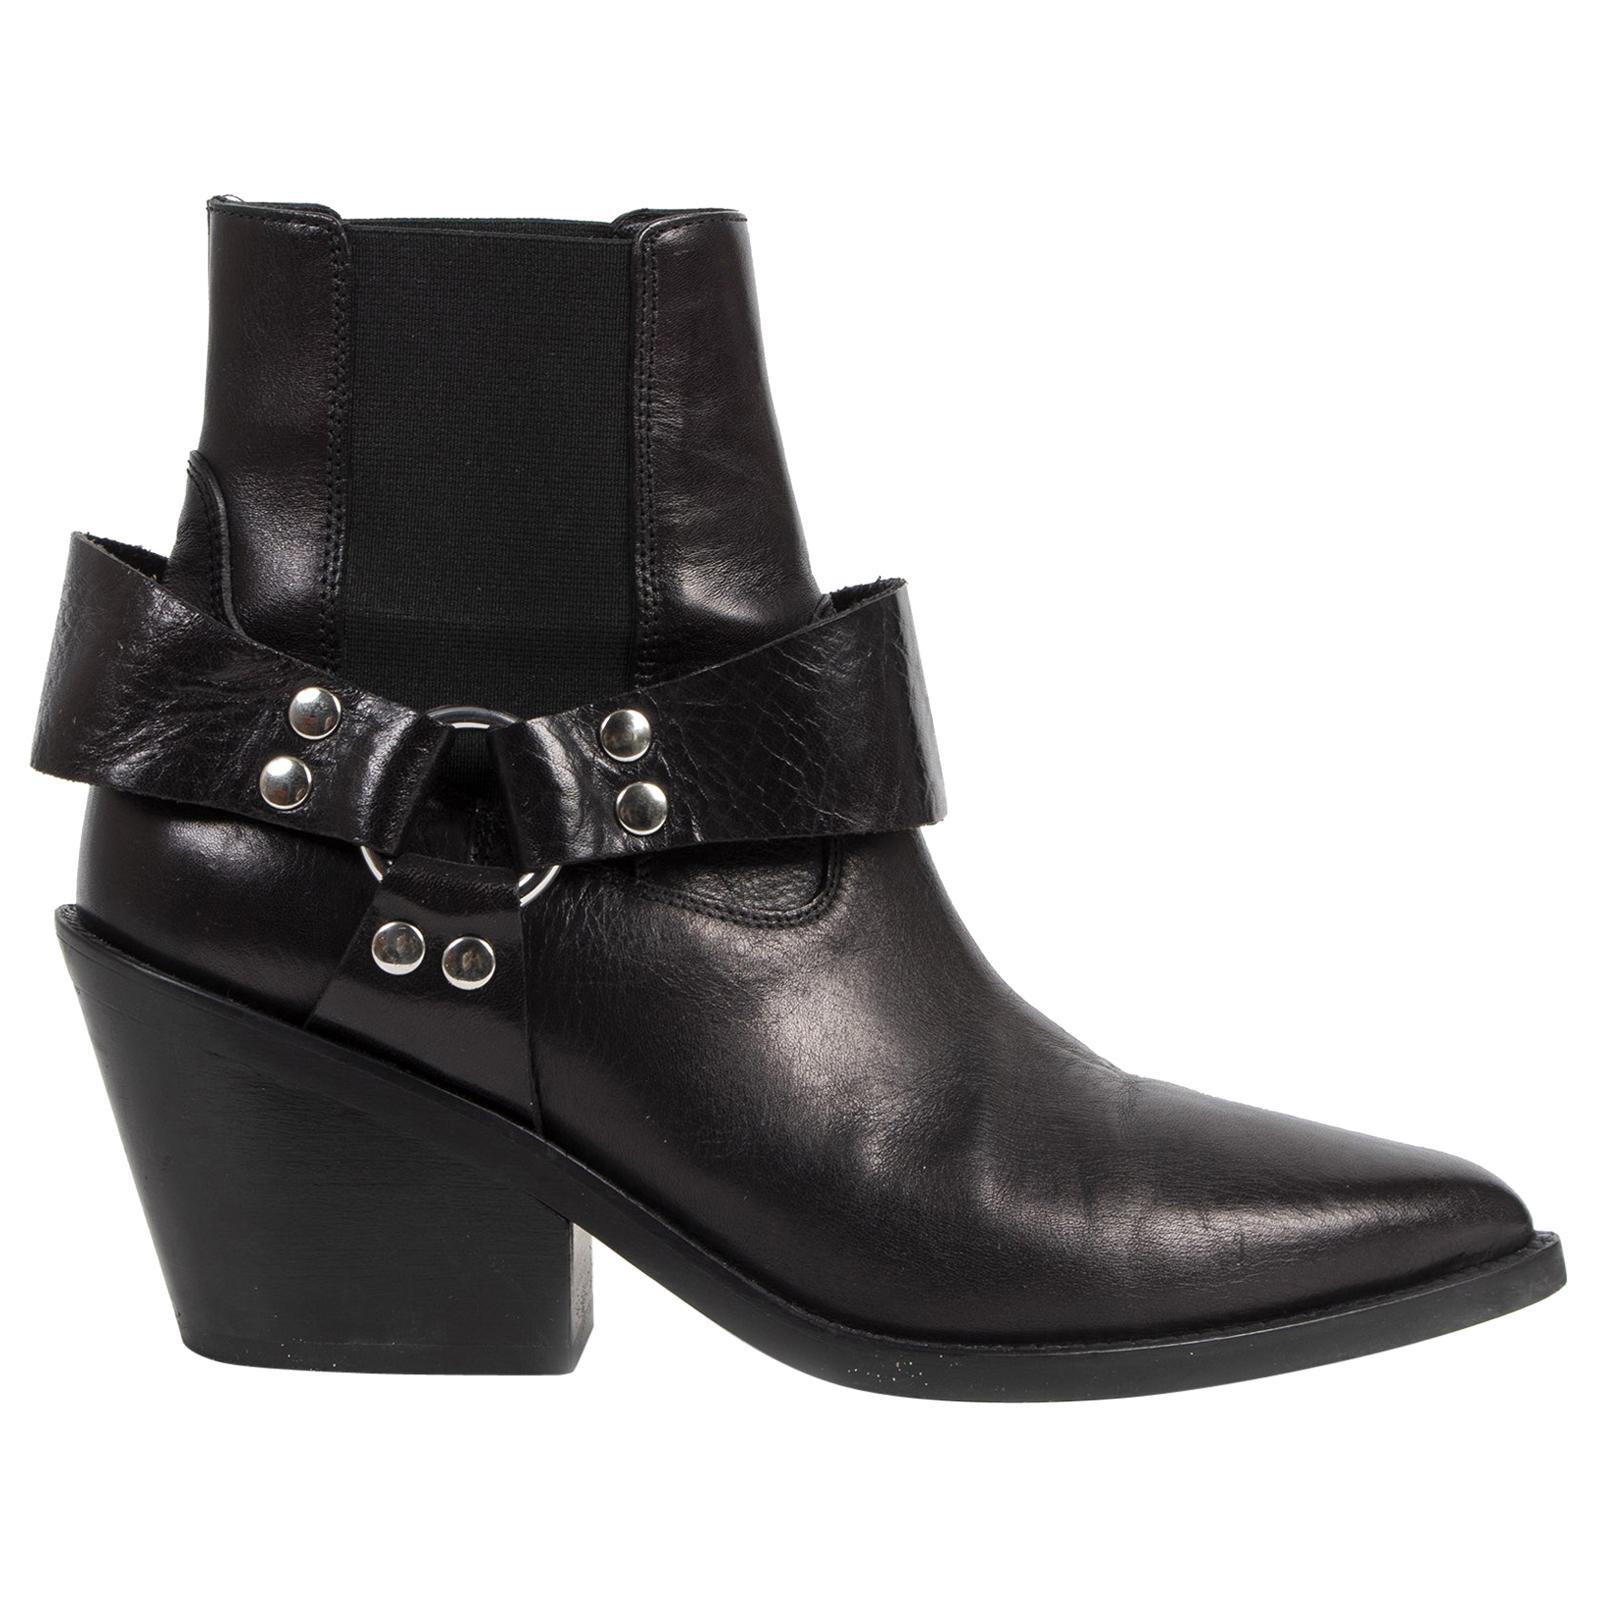 Maison Margiela Black Leather Ankle Boots - Size 38